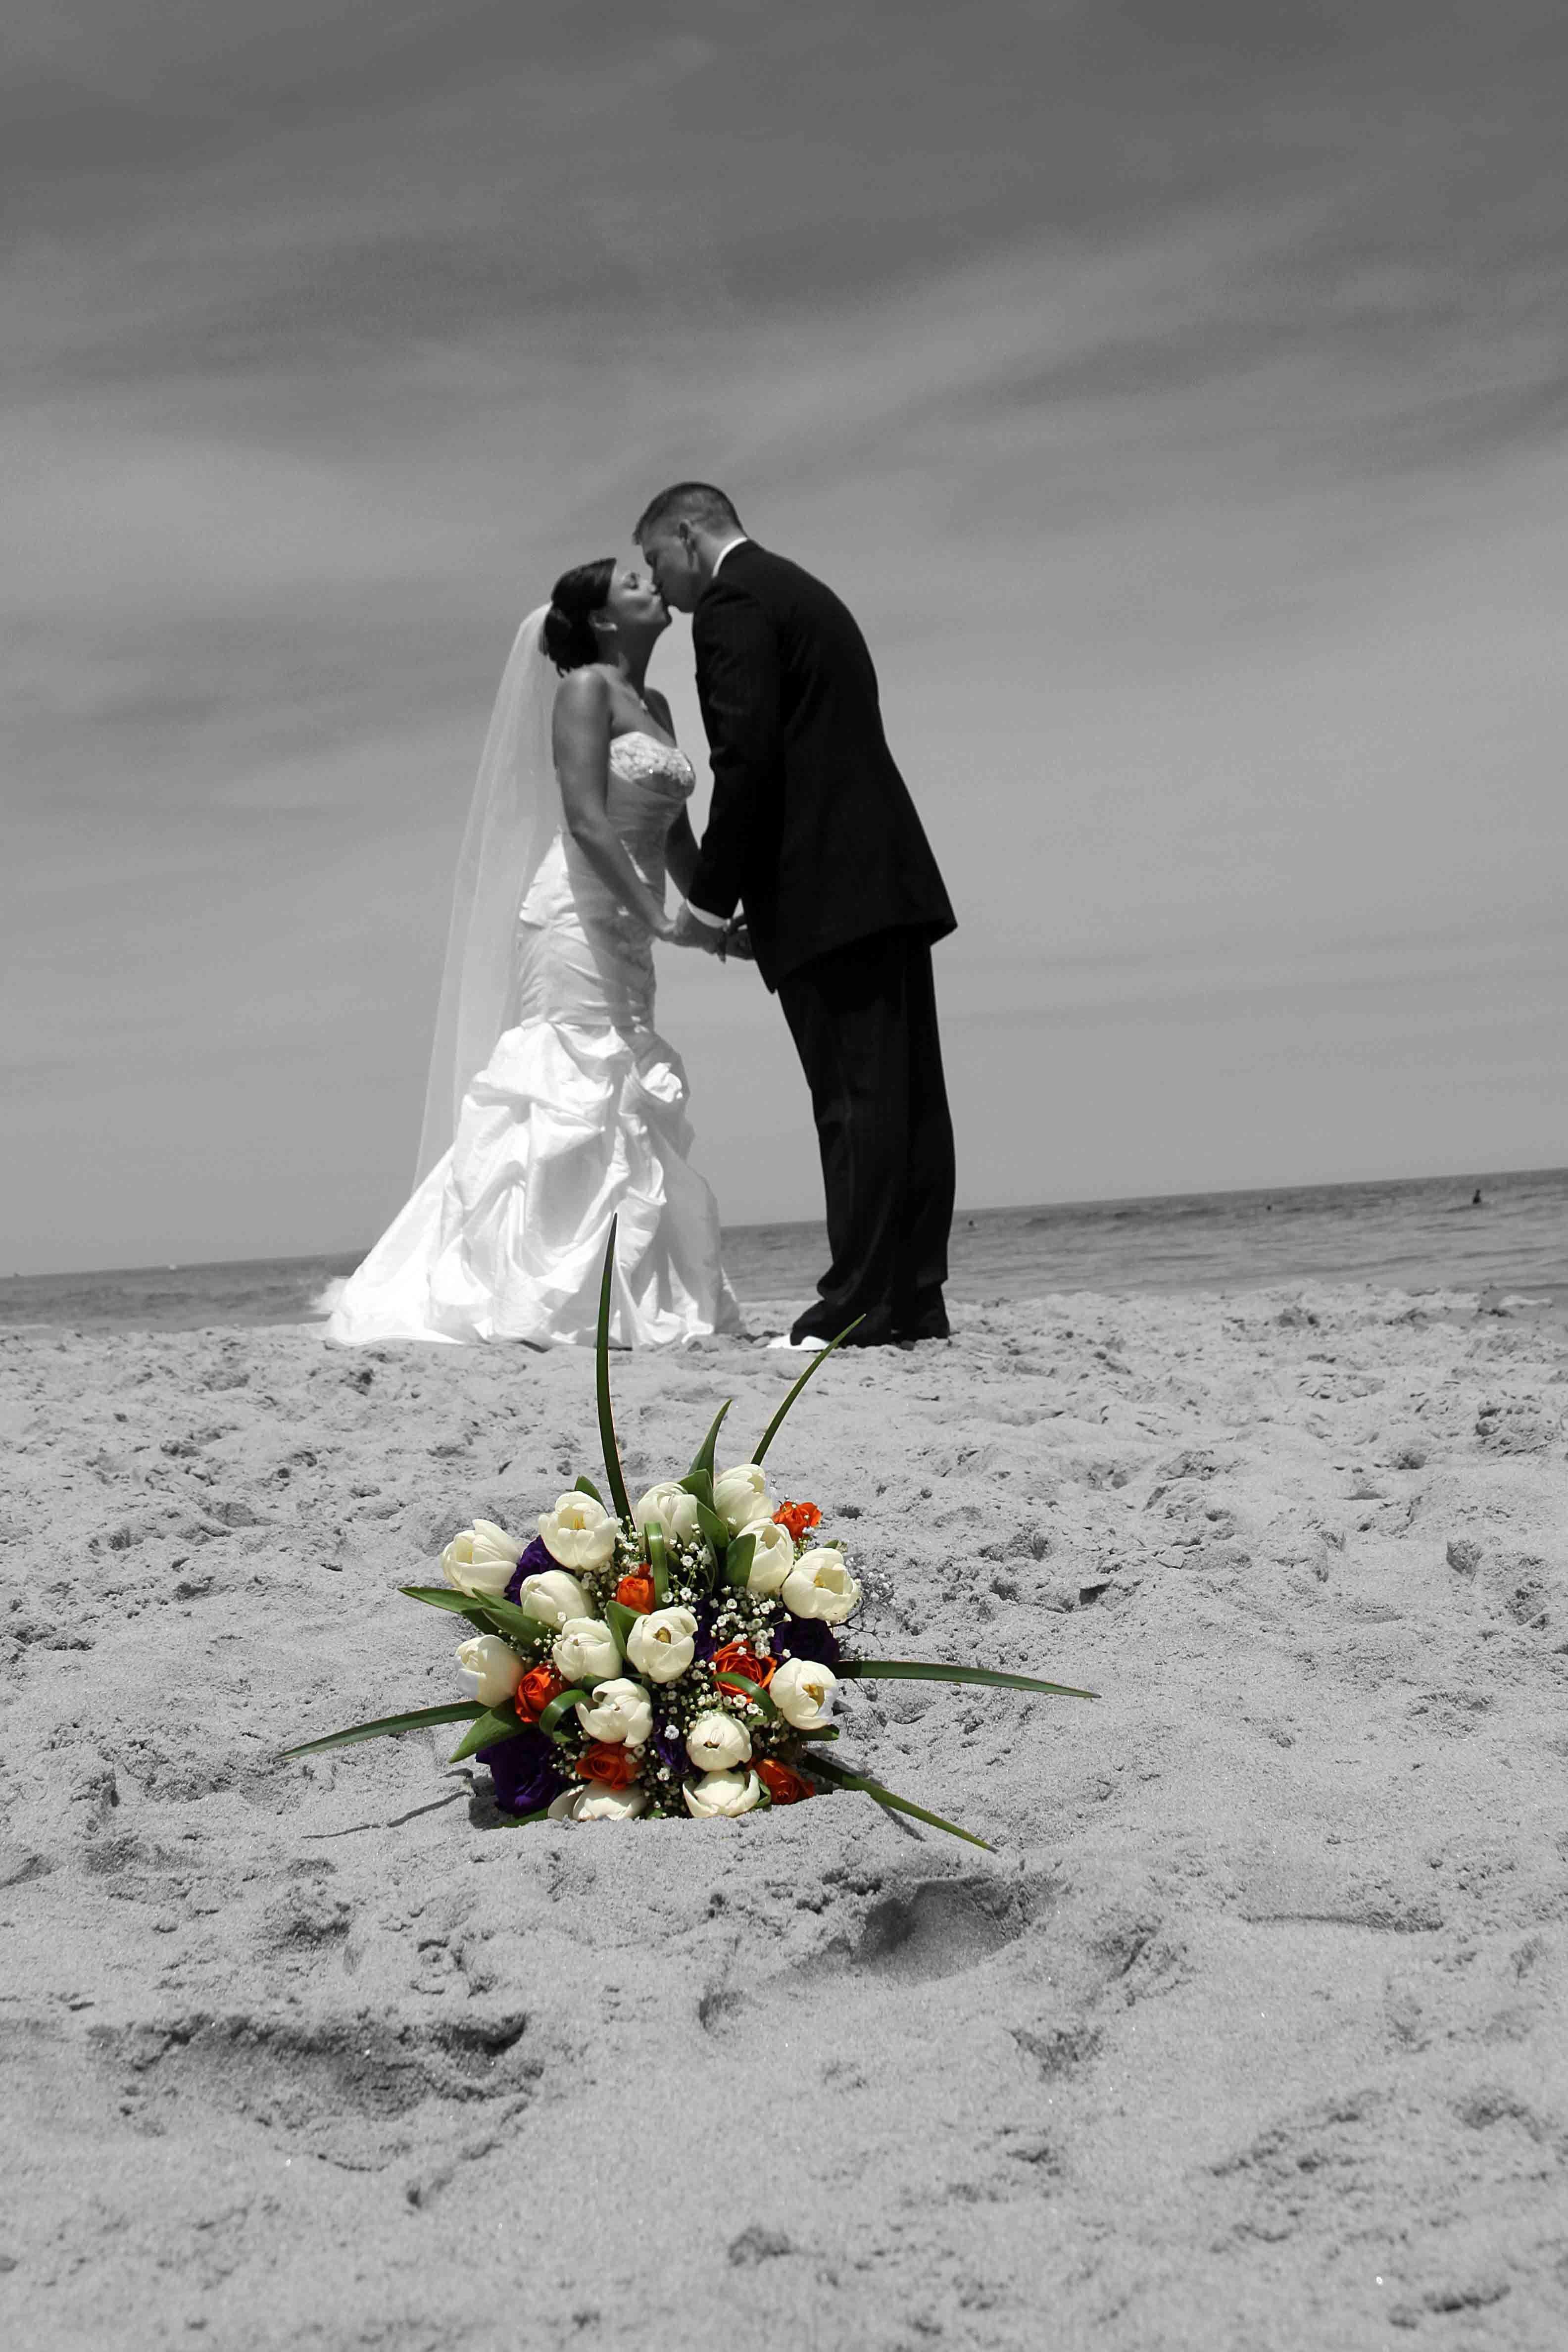 Shawn Femia Photography of Virginia Beach Wedding beach